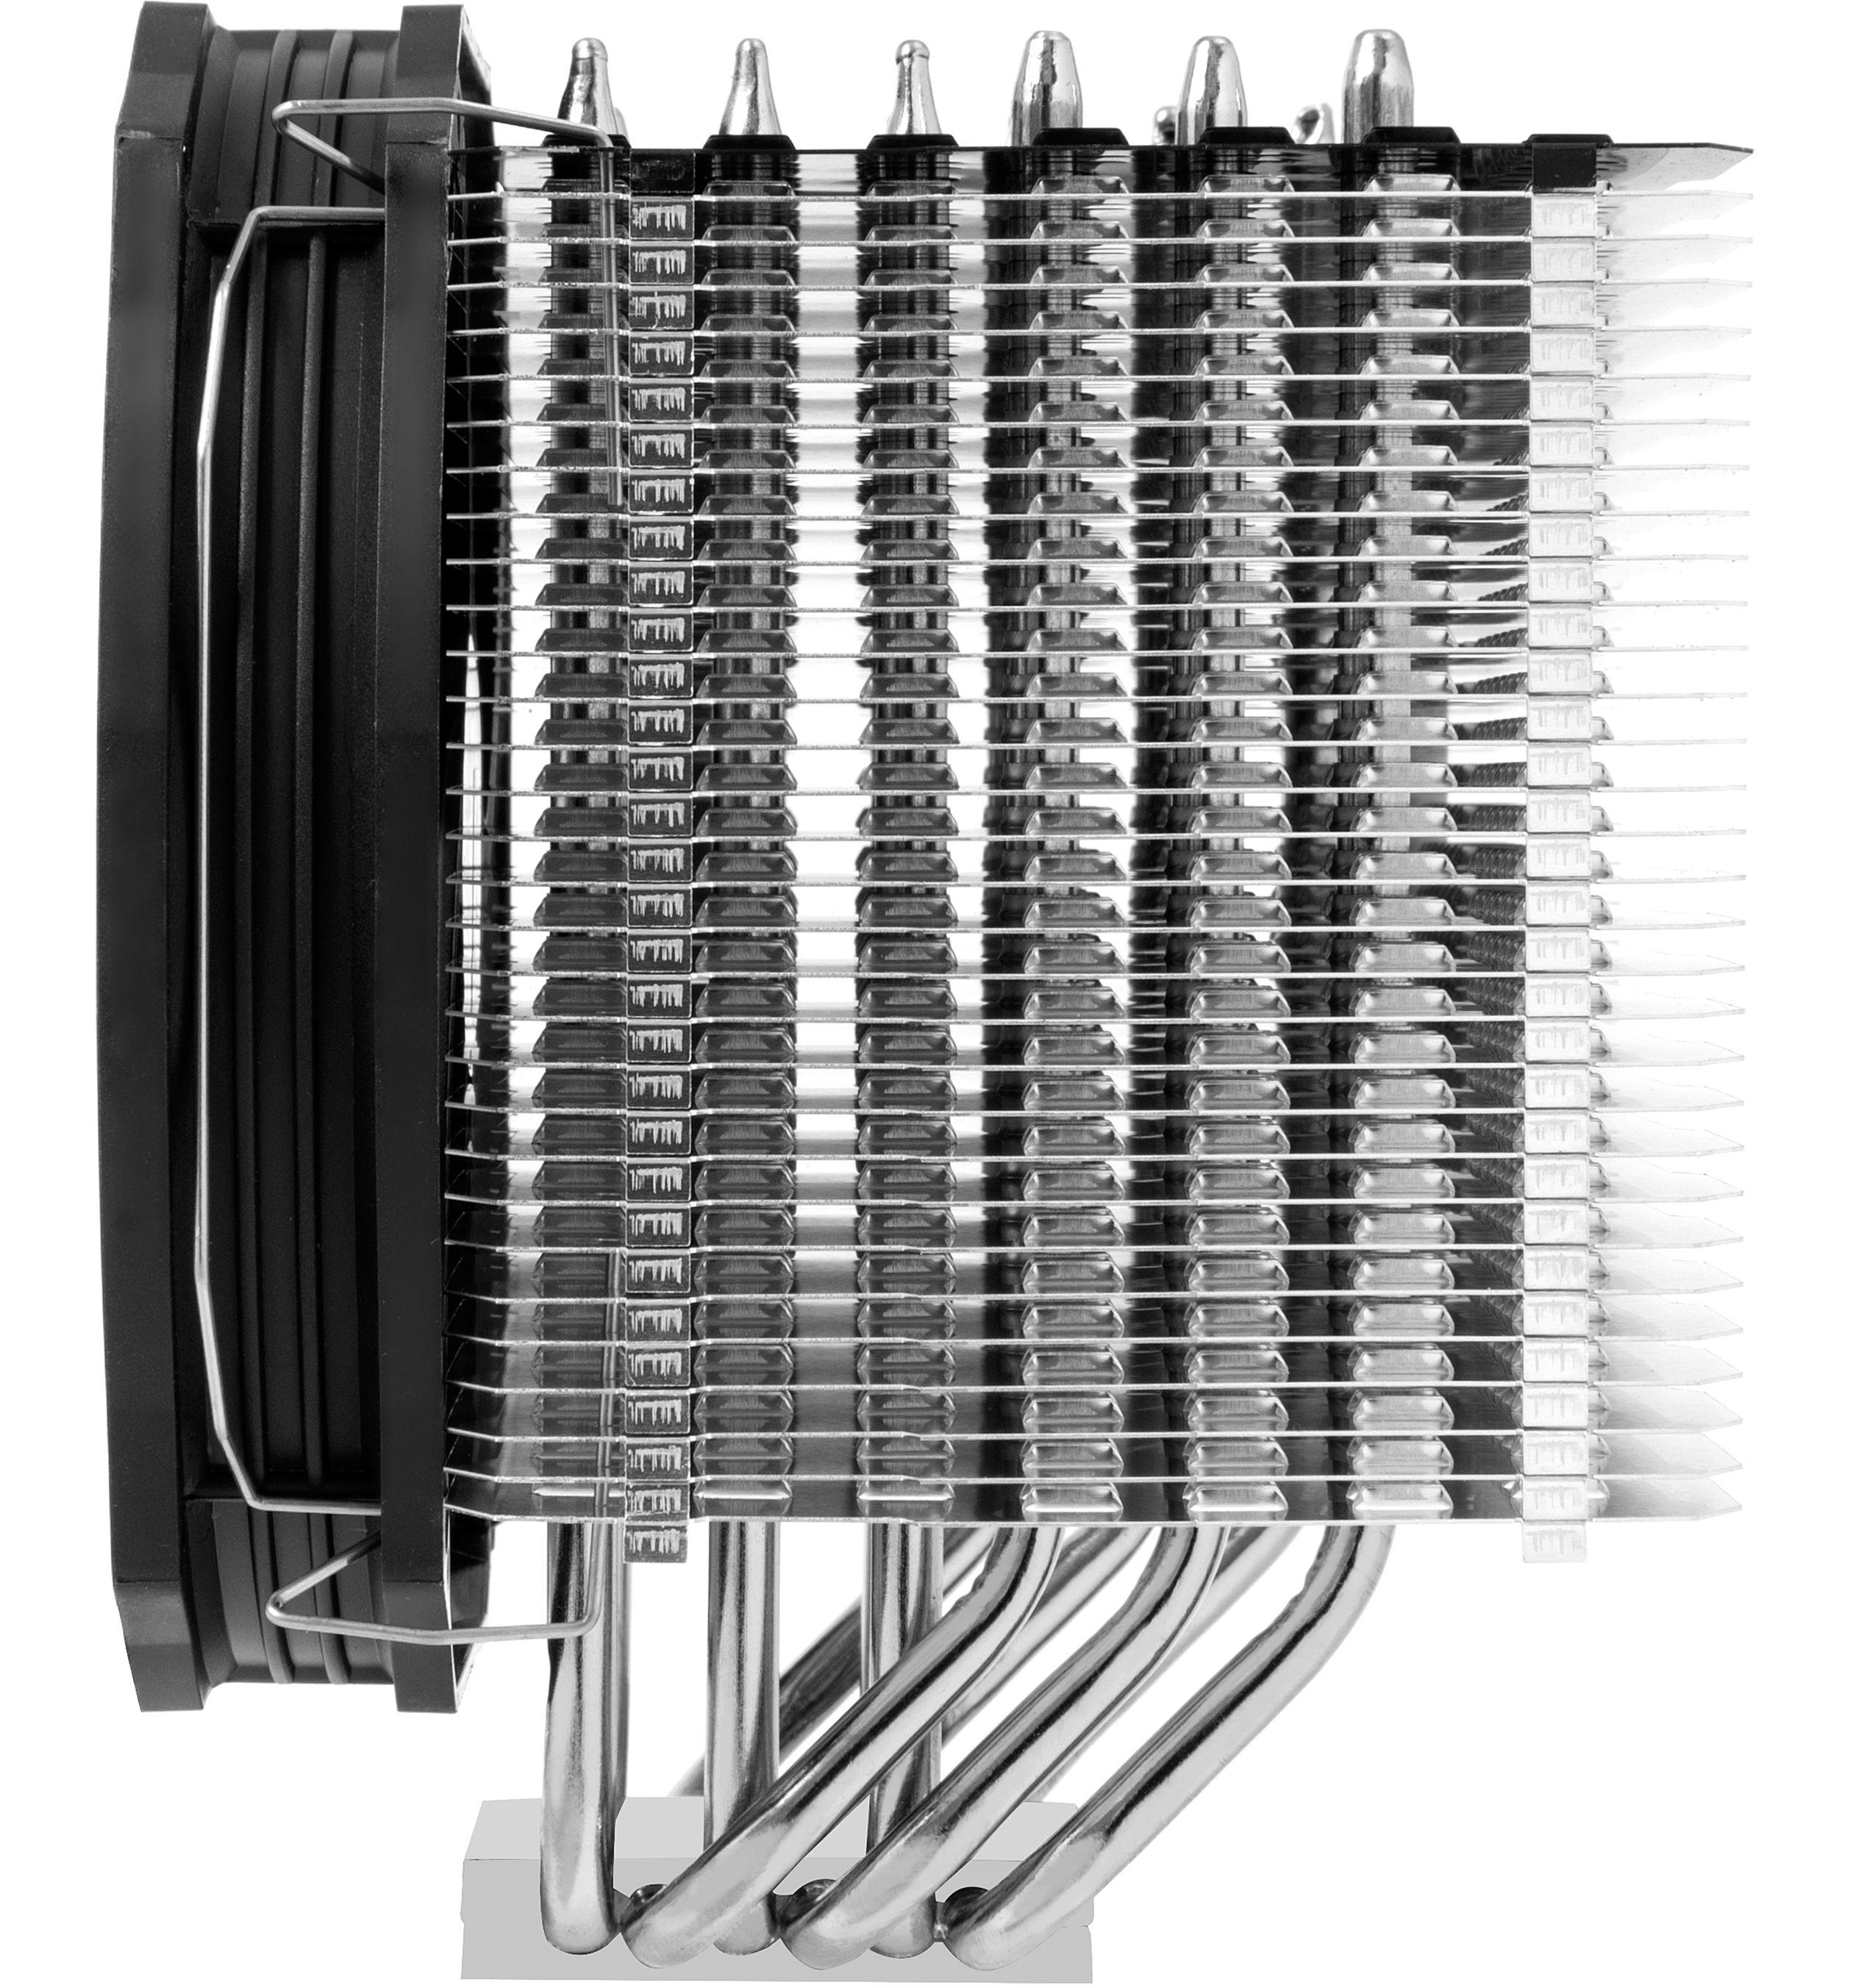 Macho Rev B High Performance Cpu Cooler